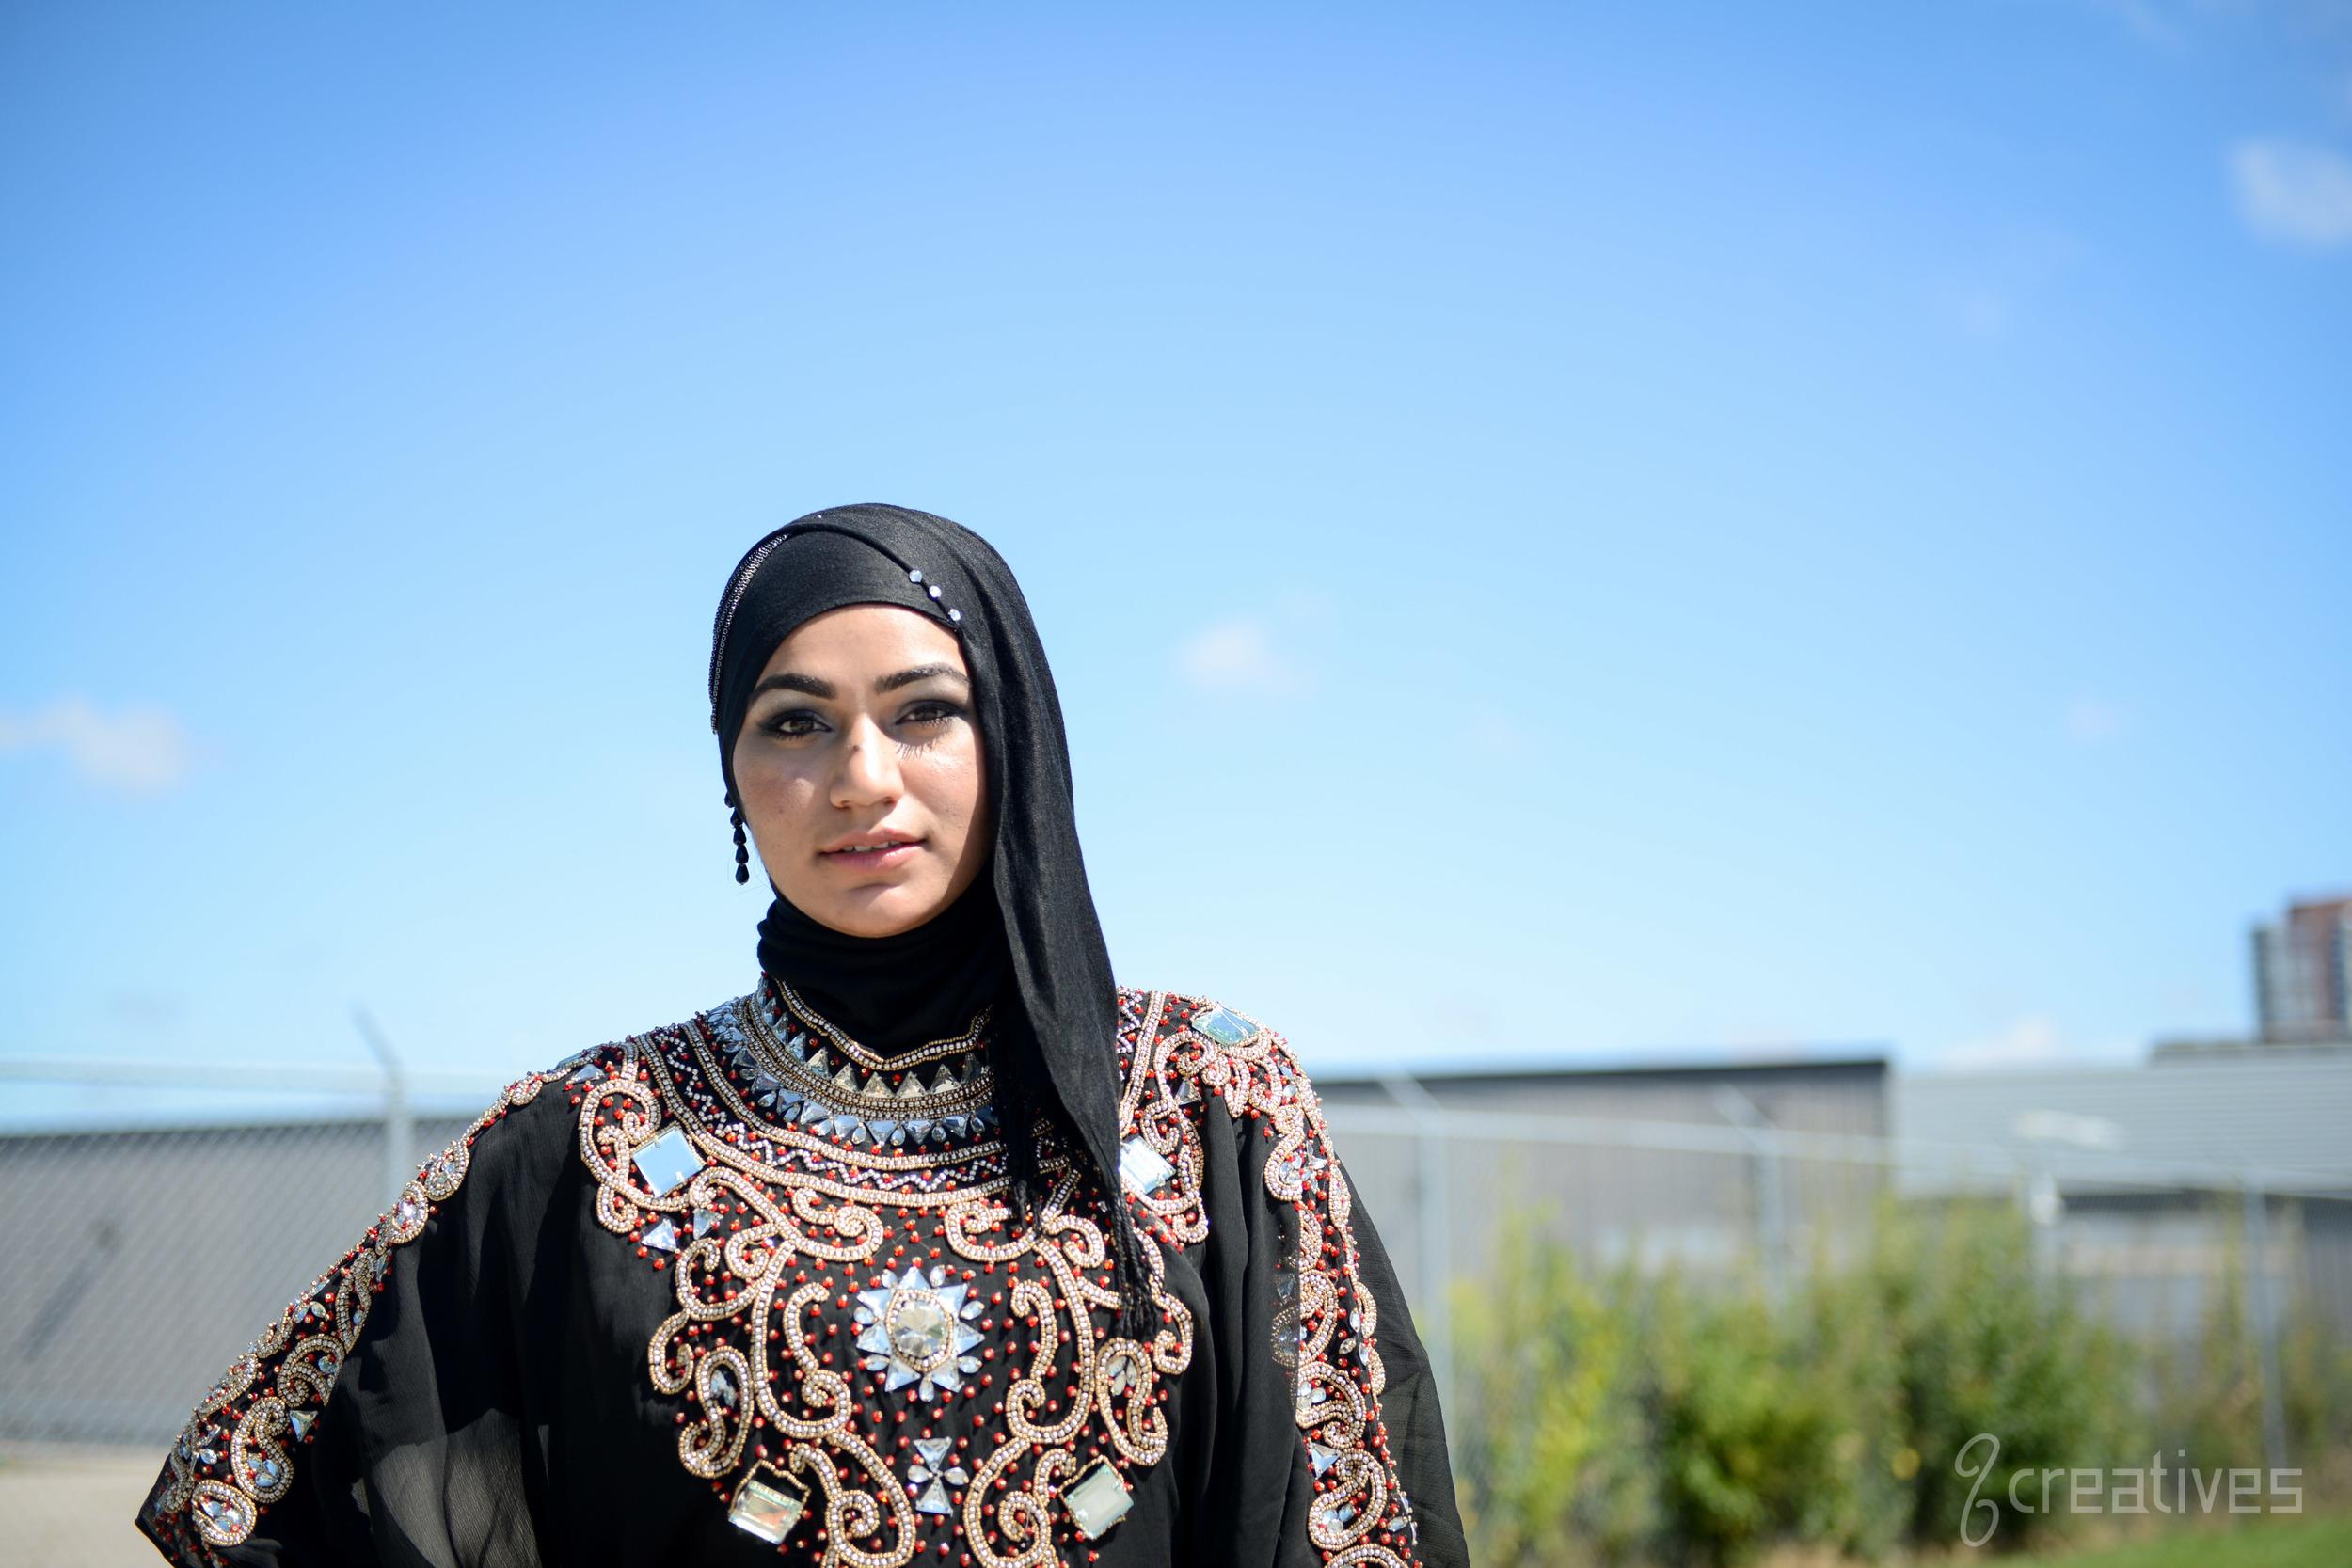 IMFDF 2014 - Iman Designs - Retouched-41